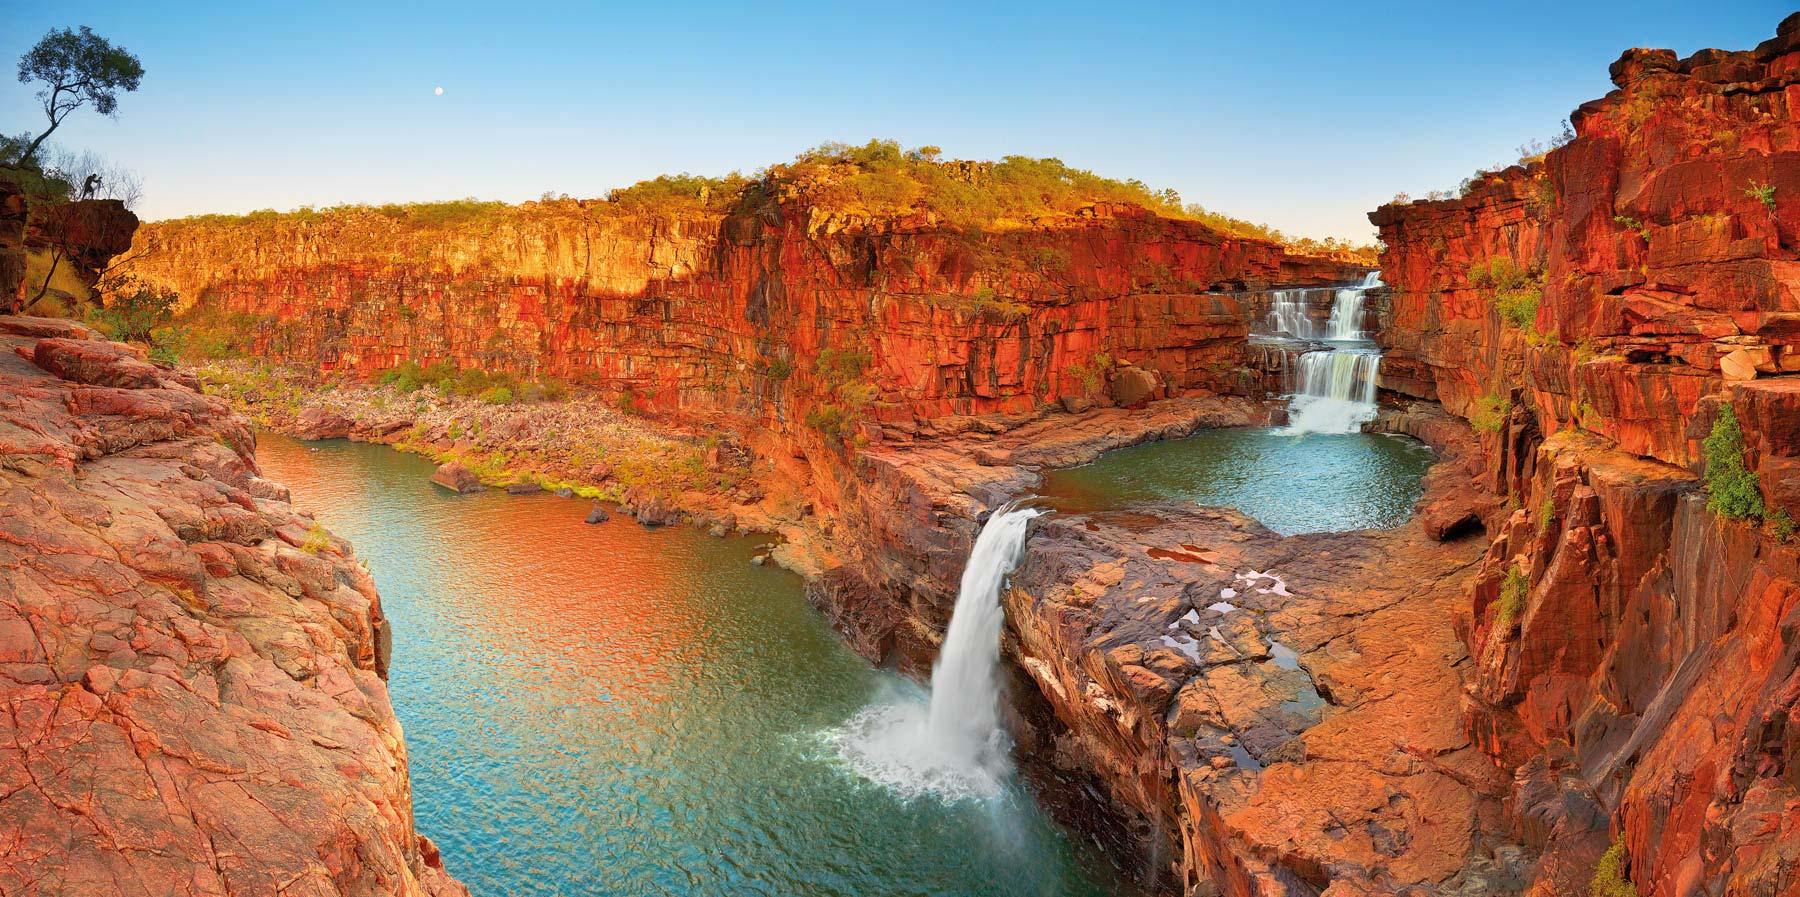 Golden light over Mitchell Falls, Kimberleys, WA, Australia.